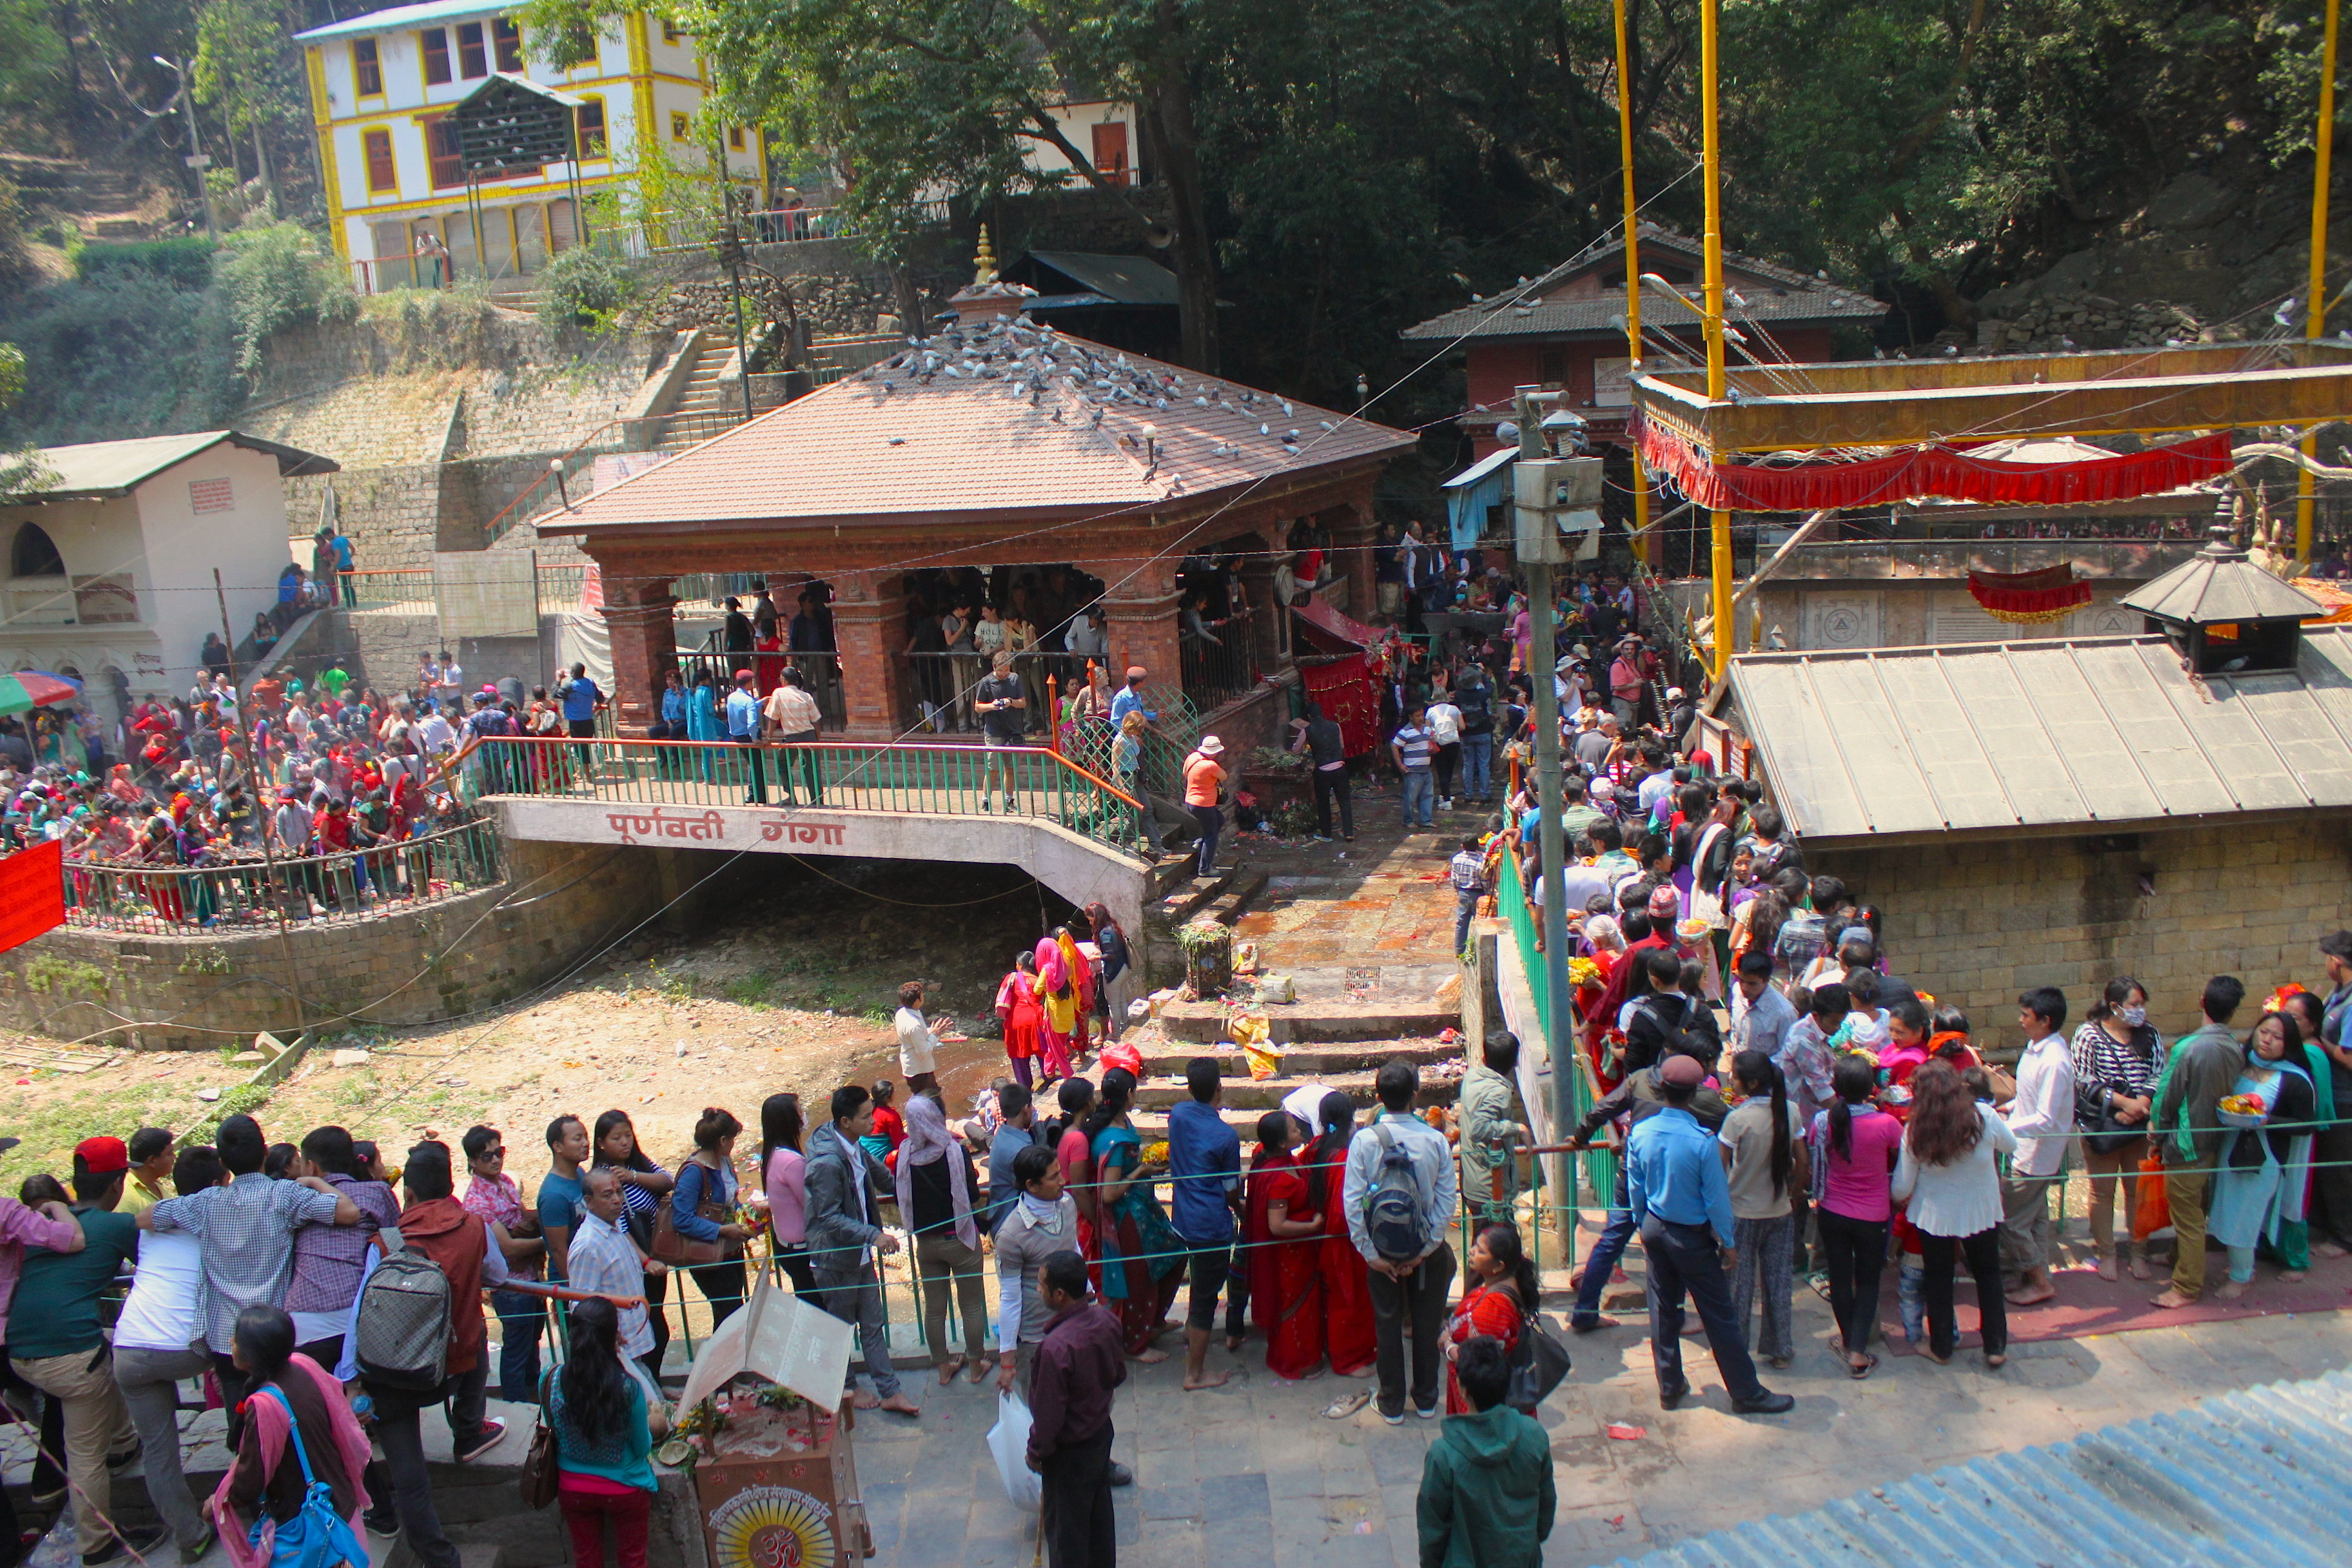 La fila per arrivare al Tempio Dakshinkali a Kathmandu in Nepal